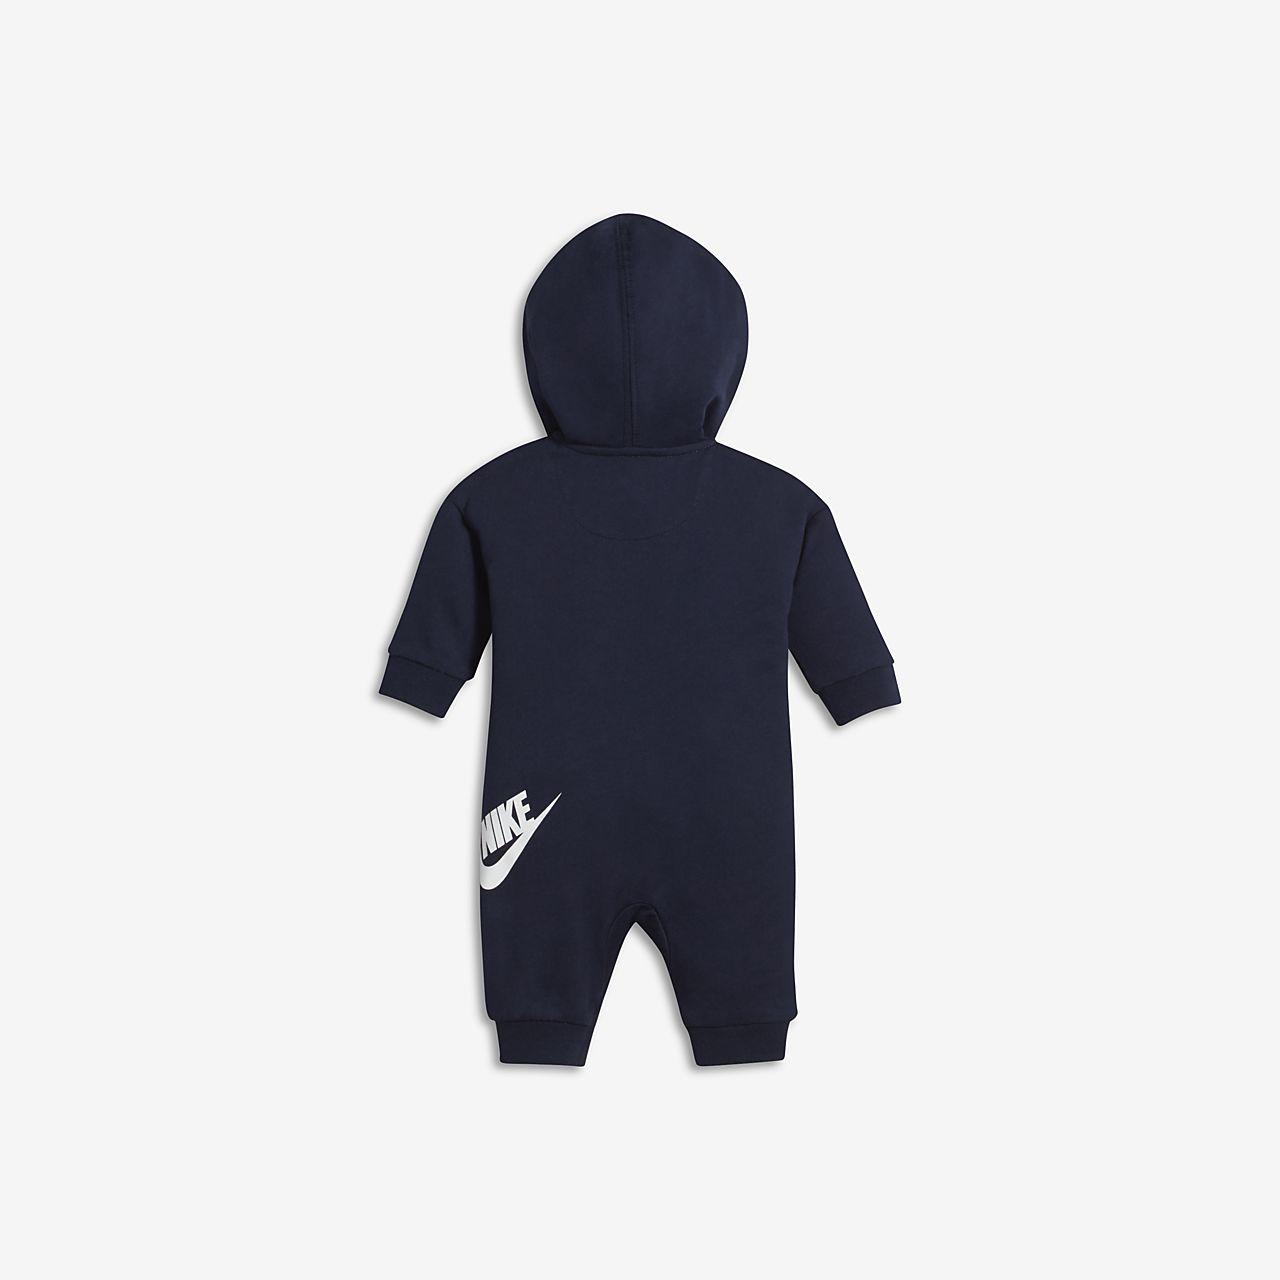 4cc6915d2 Nike Futura Infant Coverall